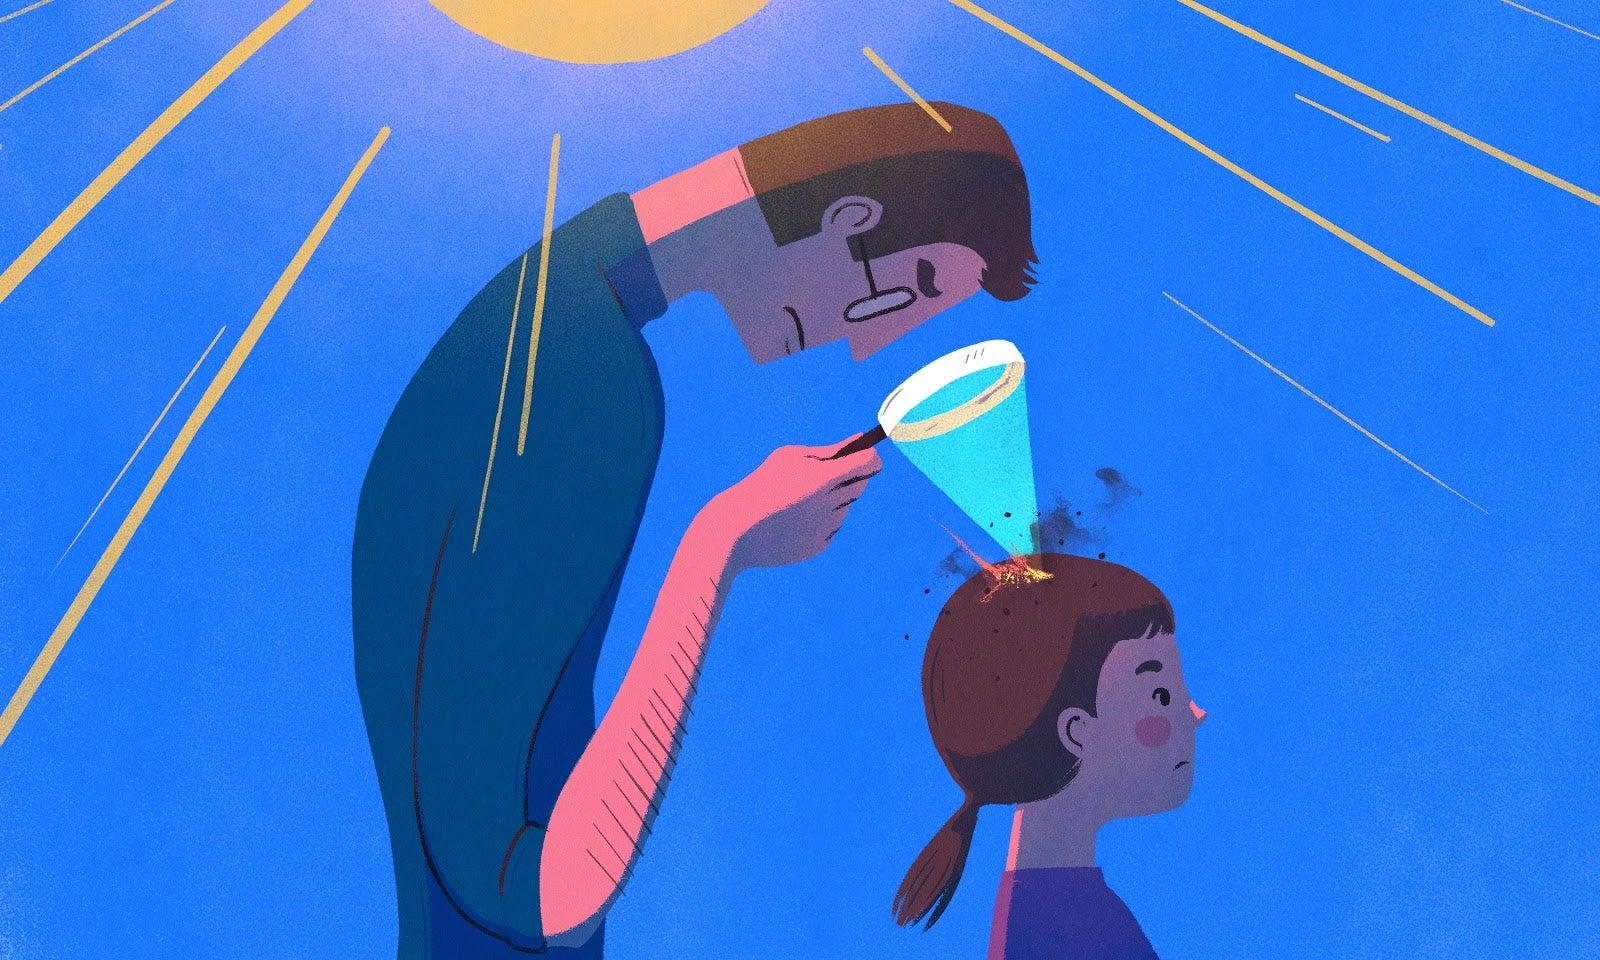 back-to-school bugs children editors-picks ew kids parasites parenting vitals